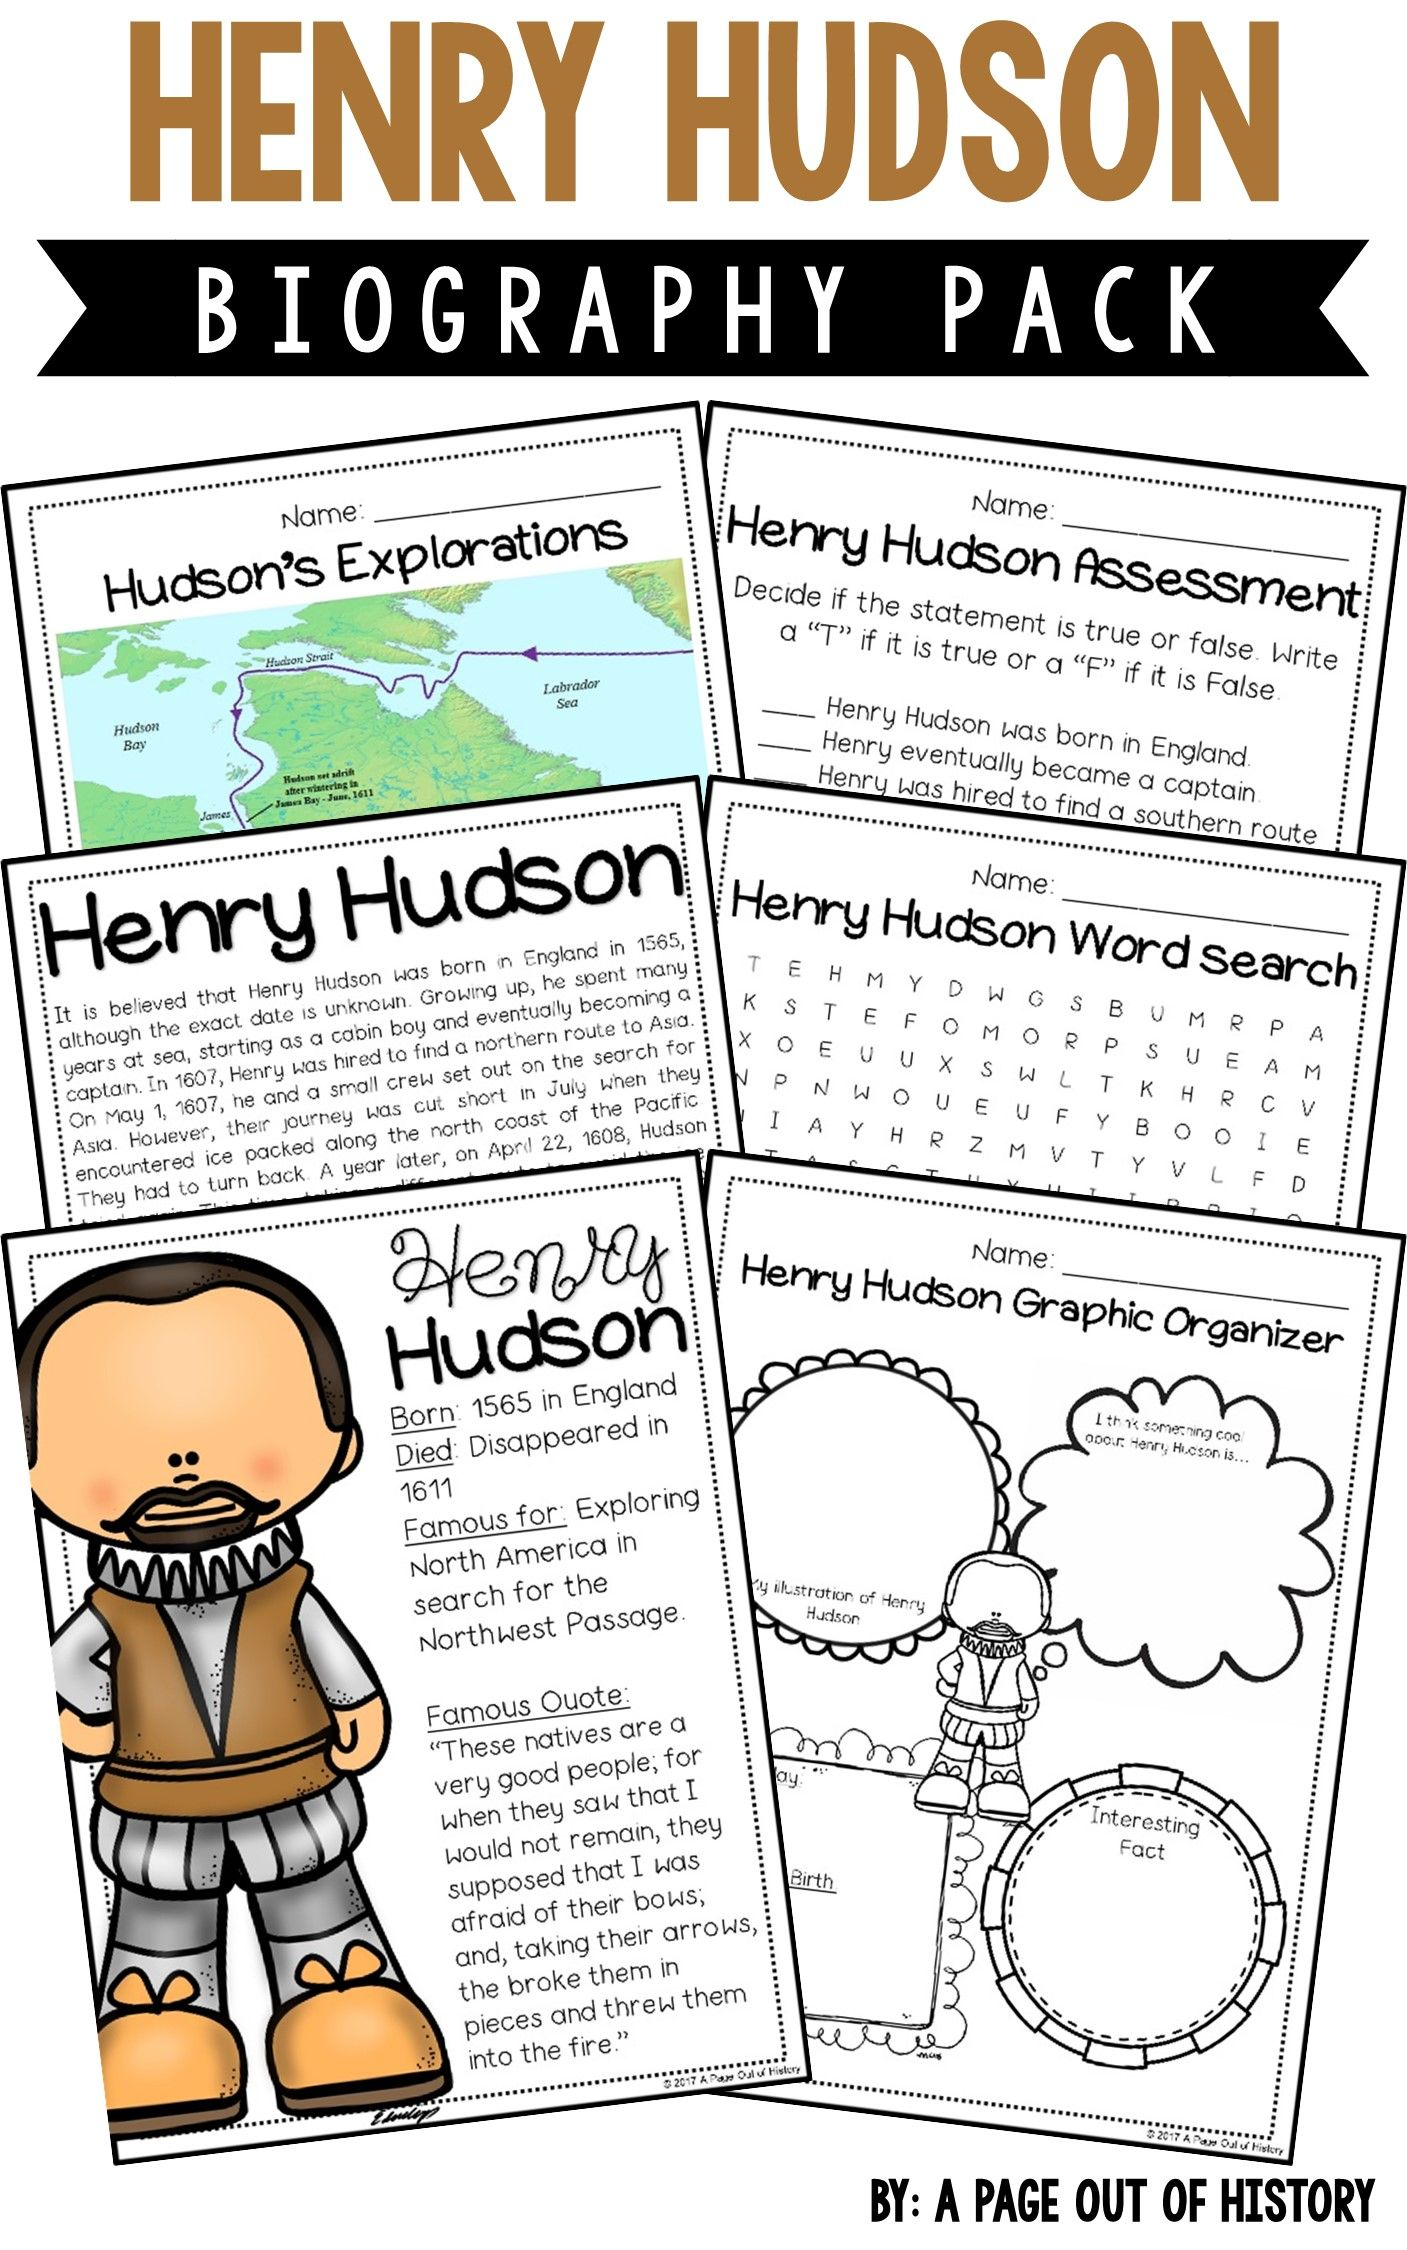 Henry Hudson Biography Pack